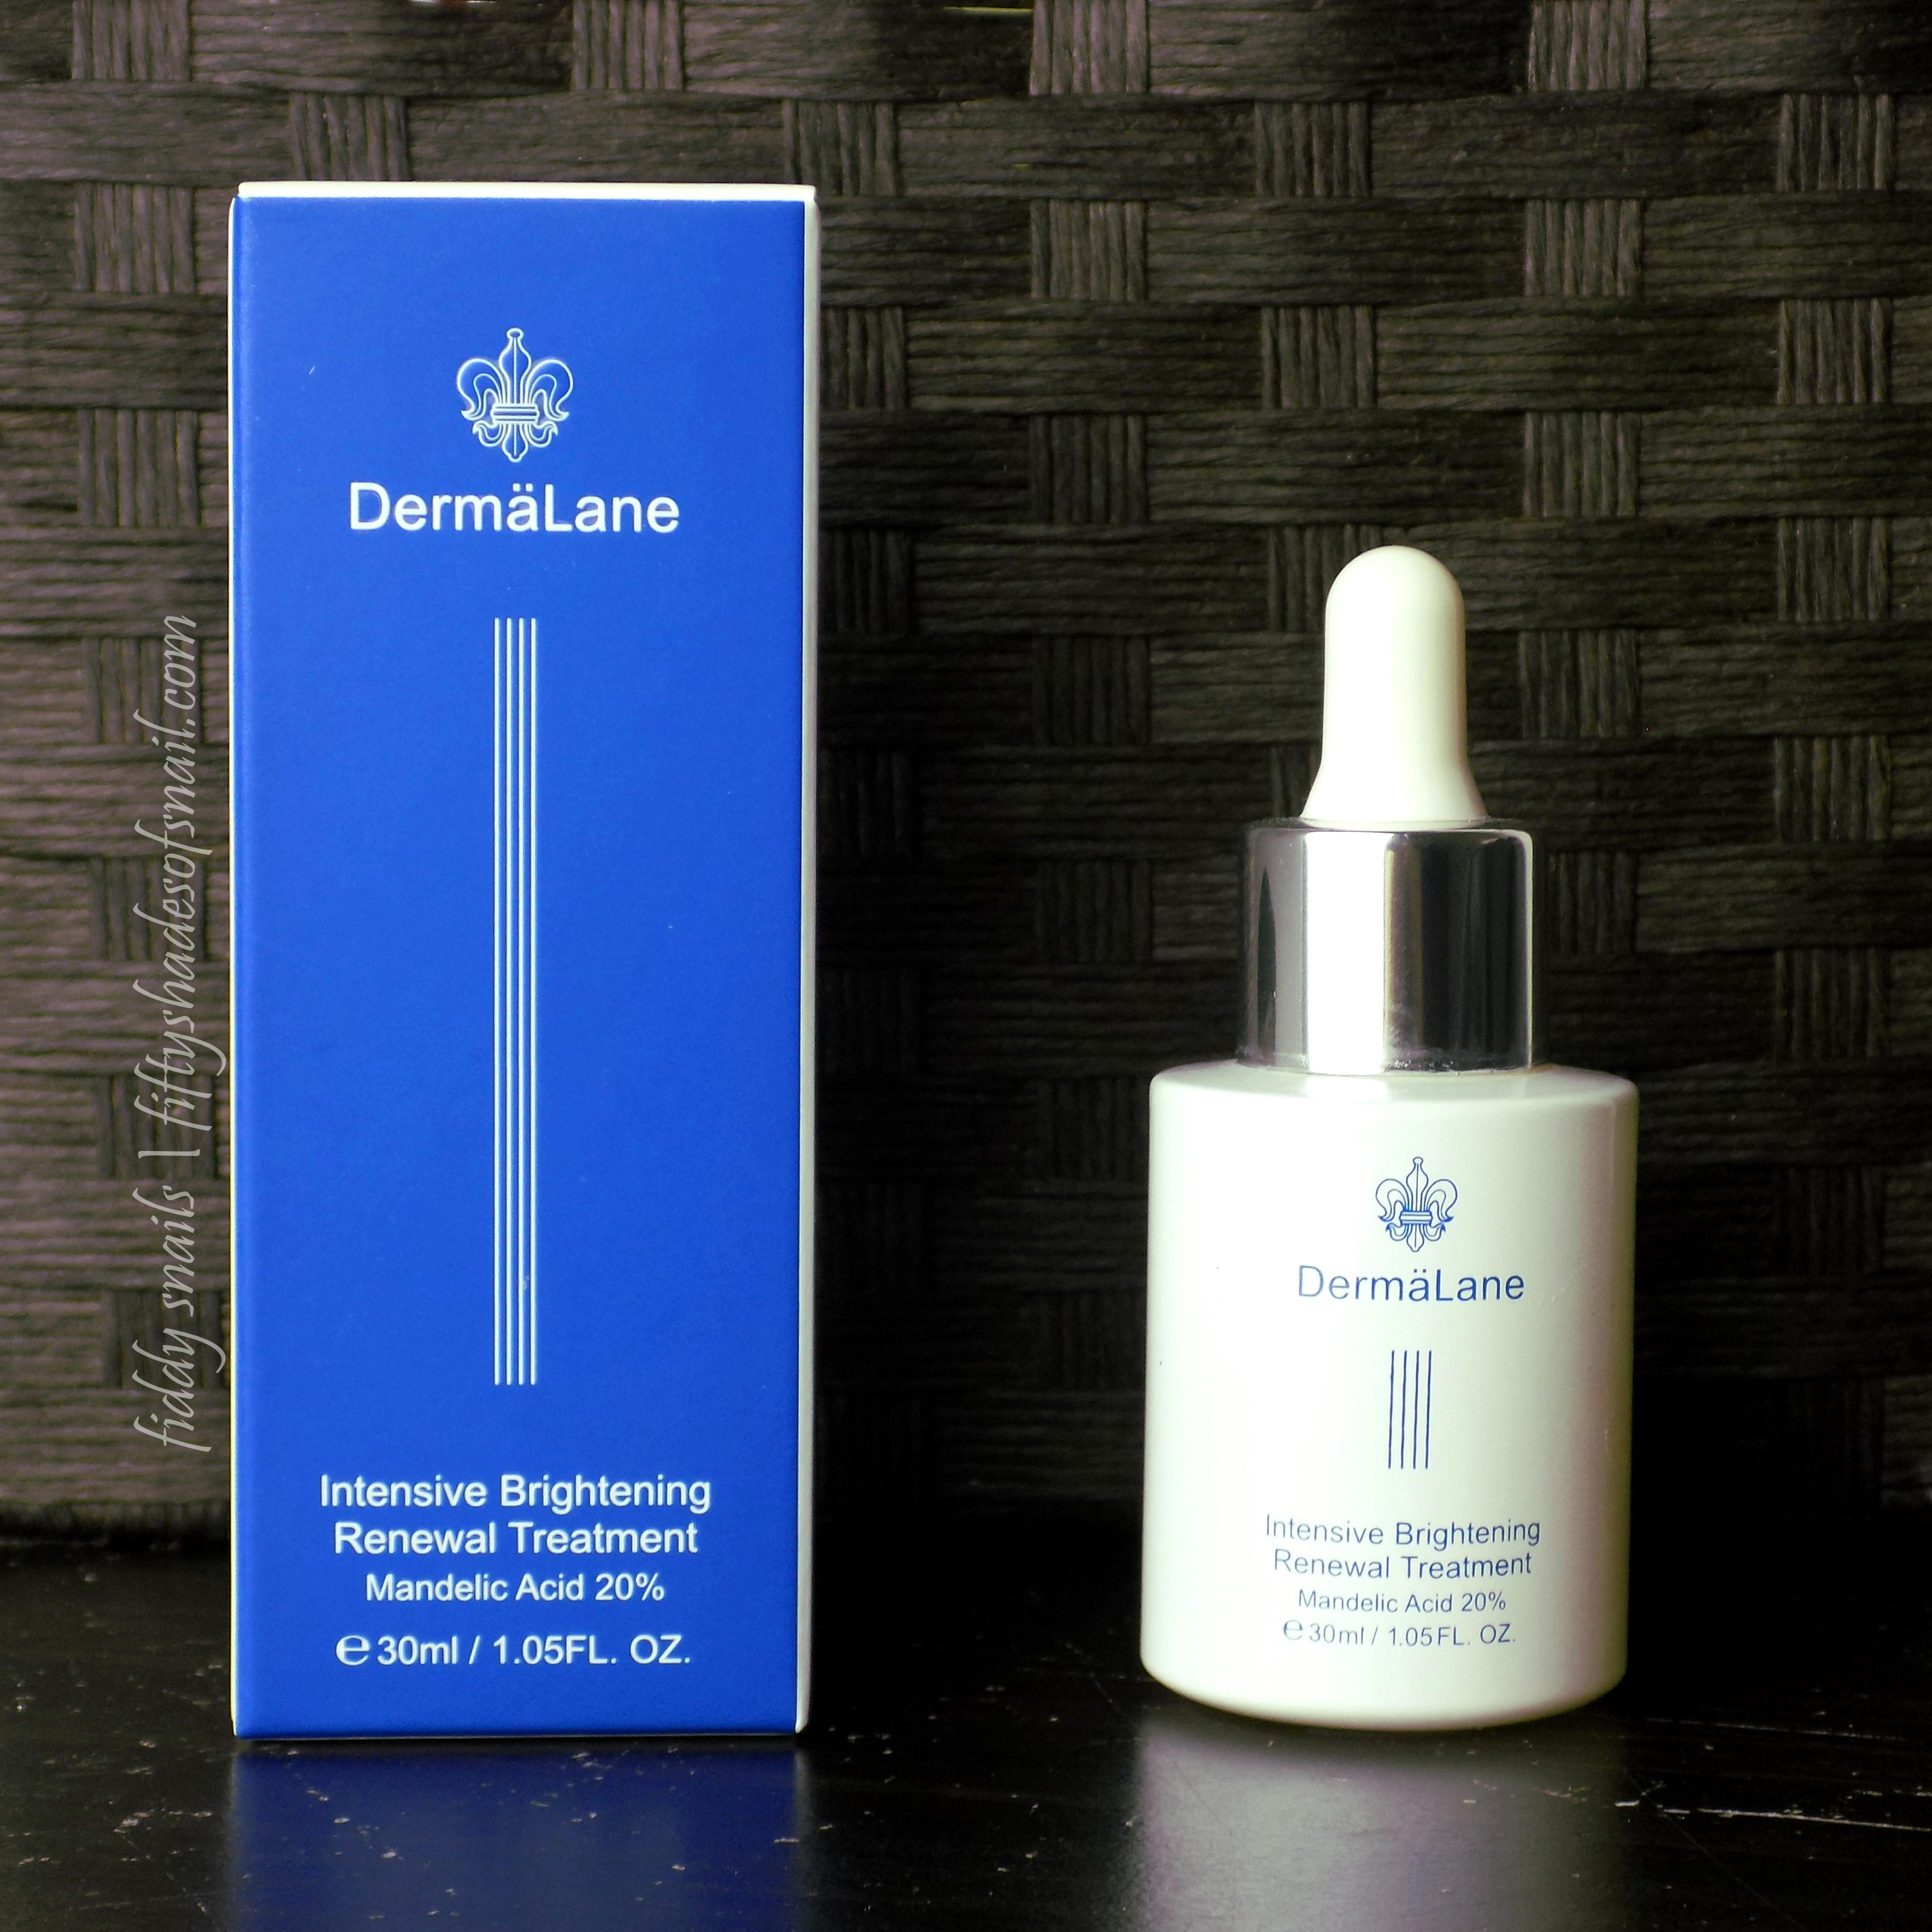 Review Naruko Dermalane Intensive Brightening Renewal Treatment 20